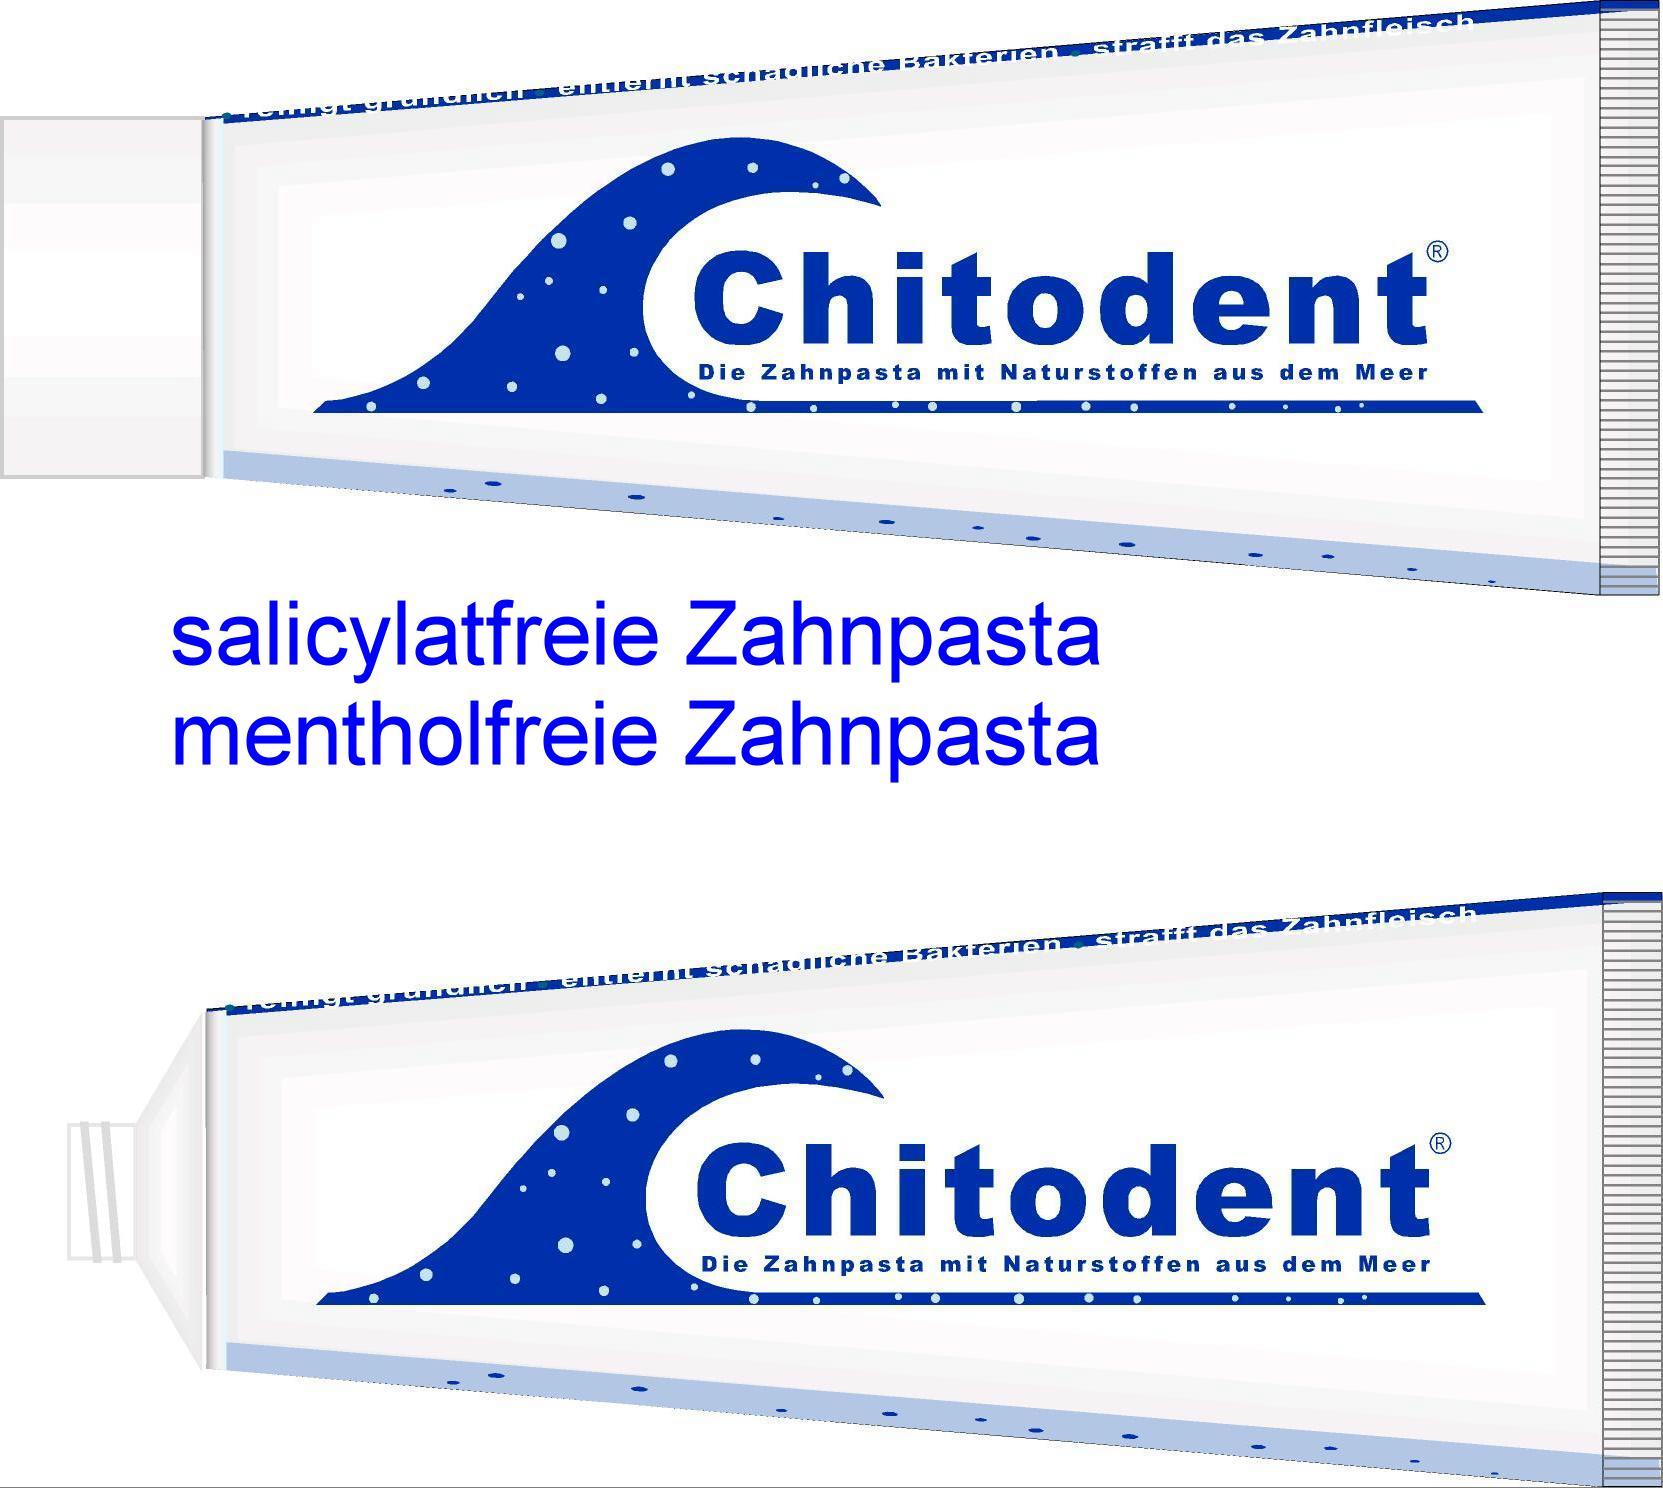 Guaifenesin-Dr-Aman-Fibromyalgie-sucht-salicylatfreie-Chitodent-Zahnpasta-